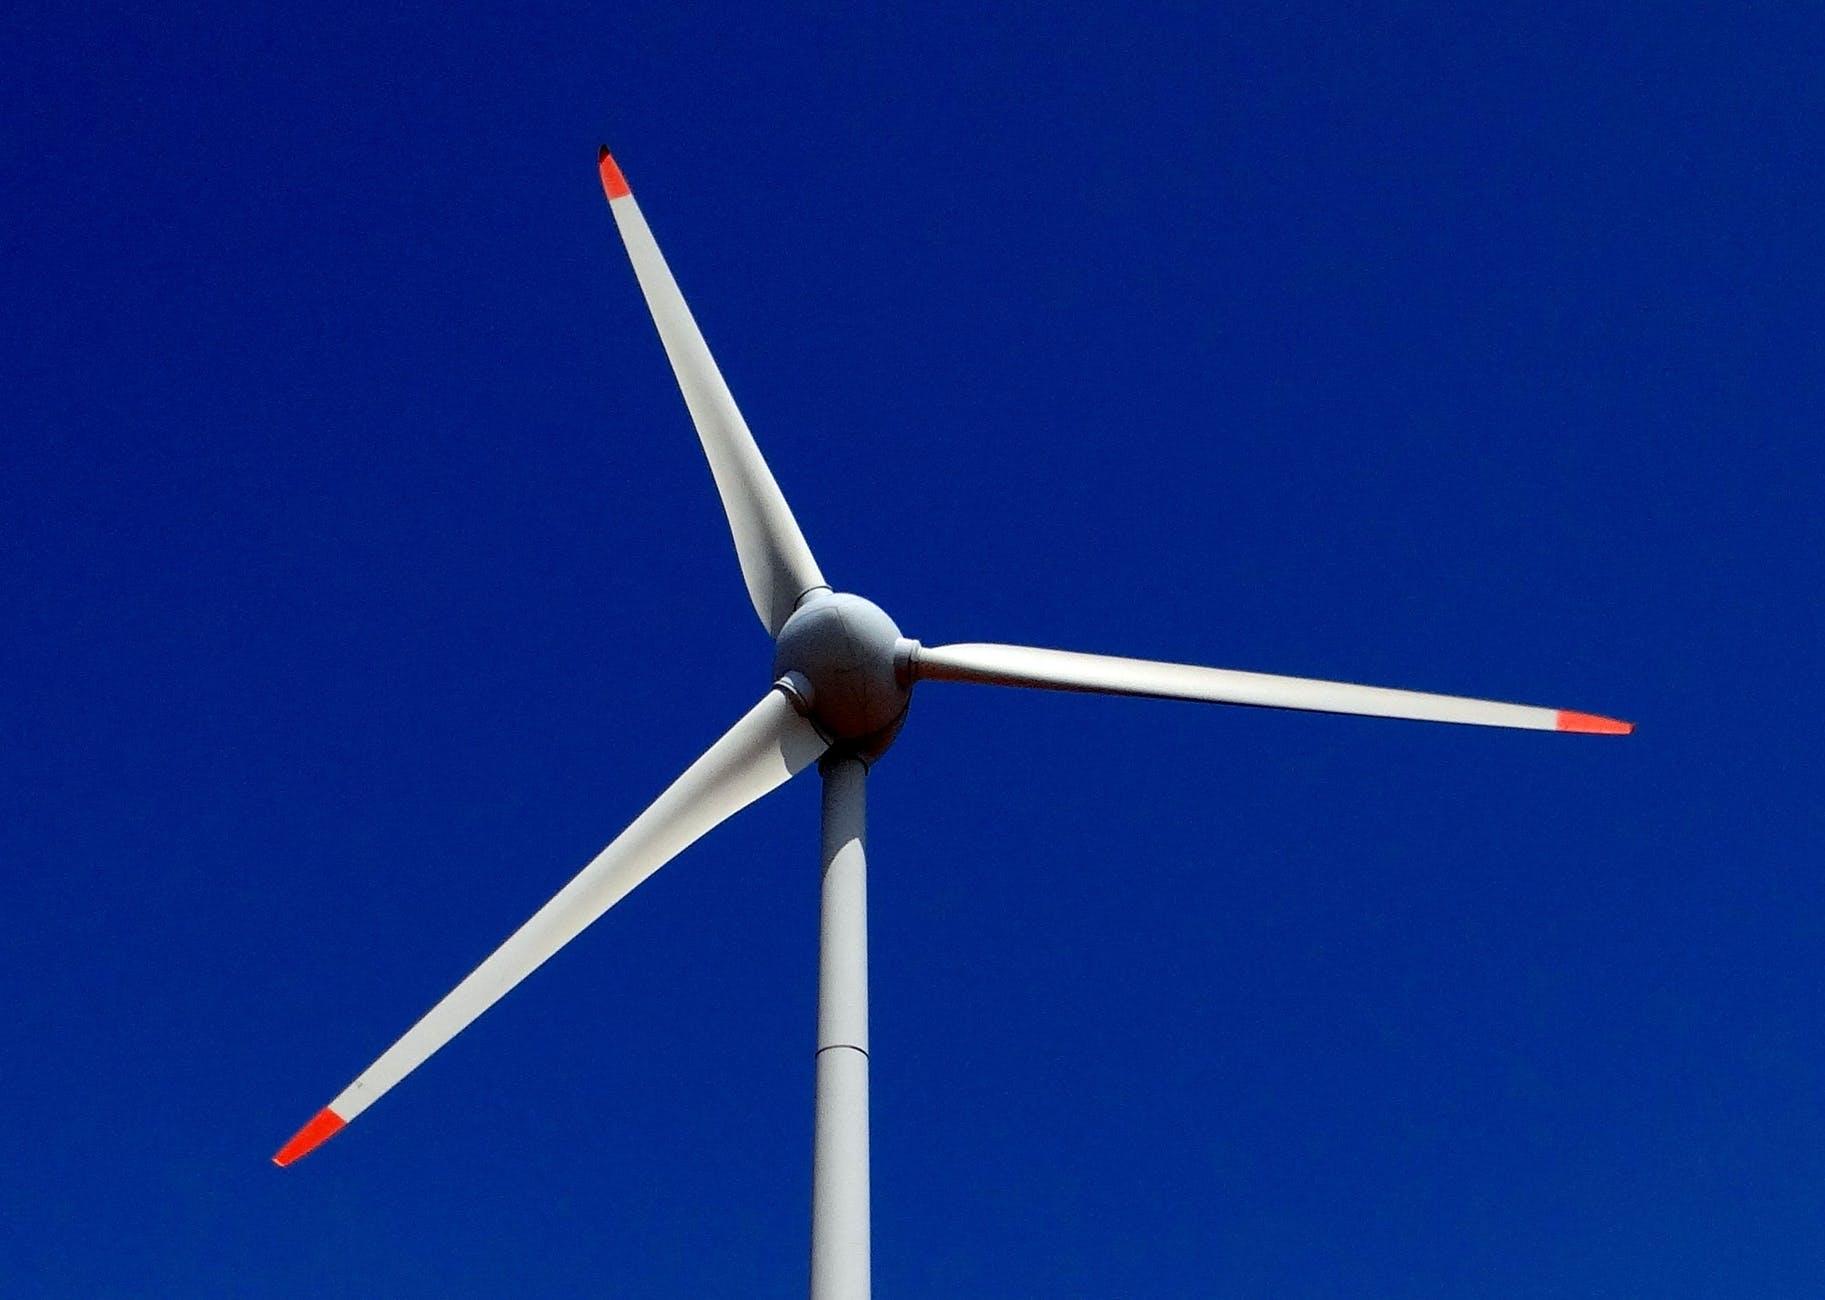 india wind turbine wind power